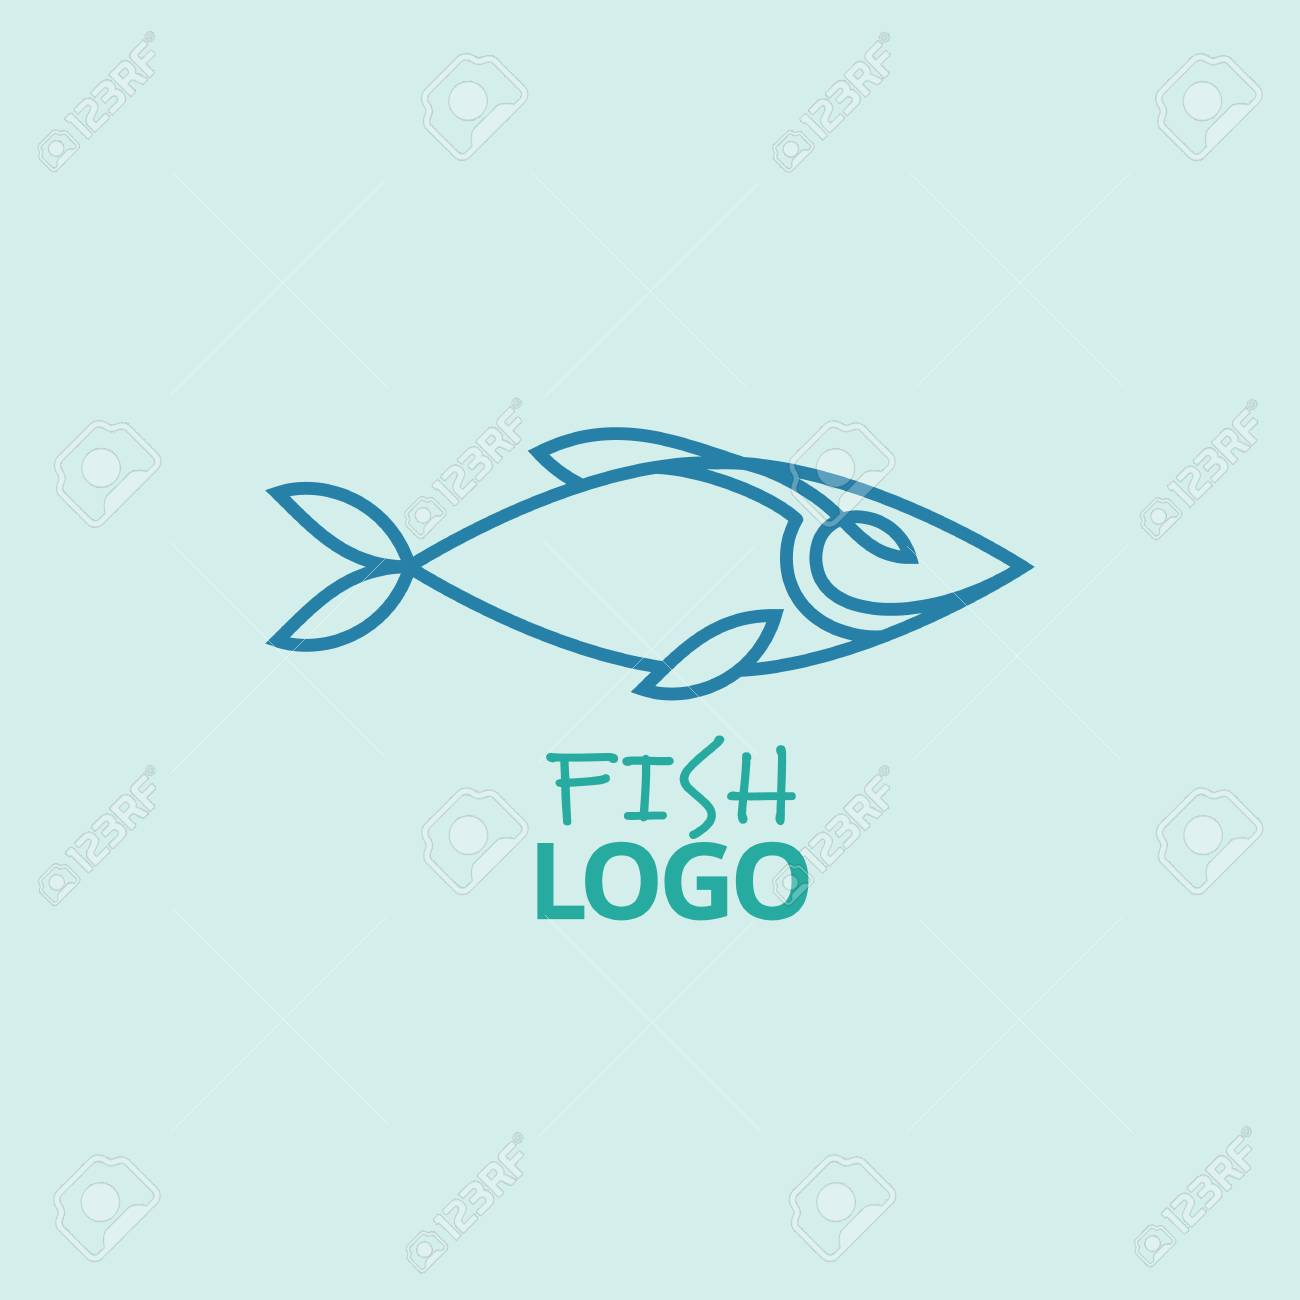 Minimalist Vector Logo Of Blue Fish Symbol For Seafood Restaurants